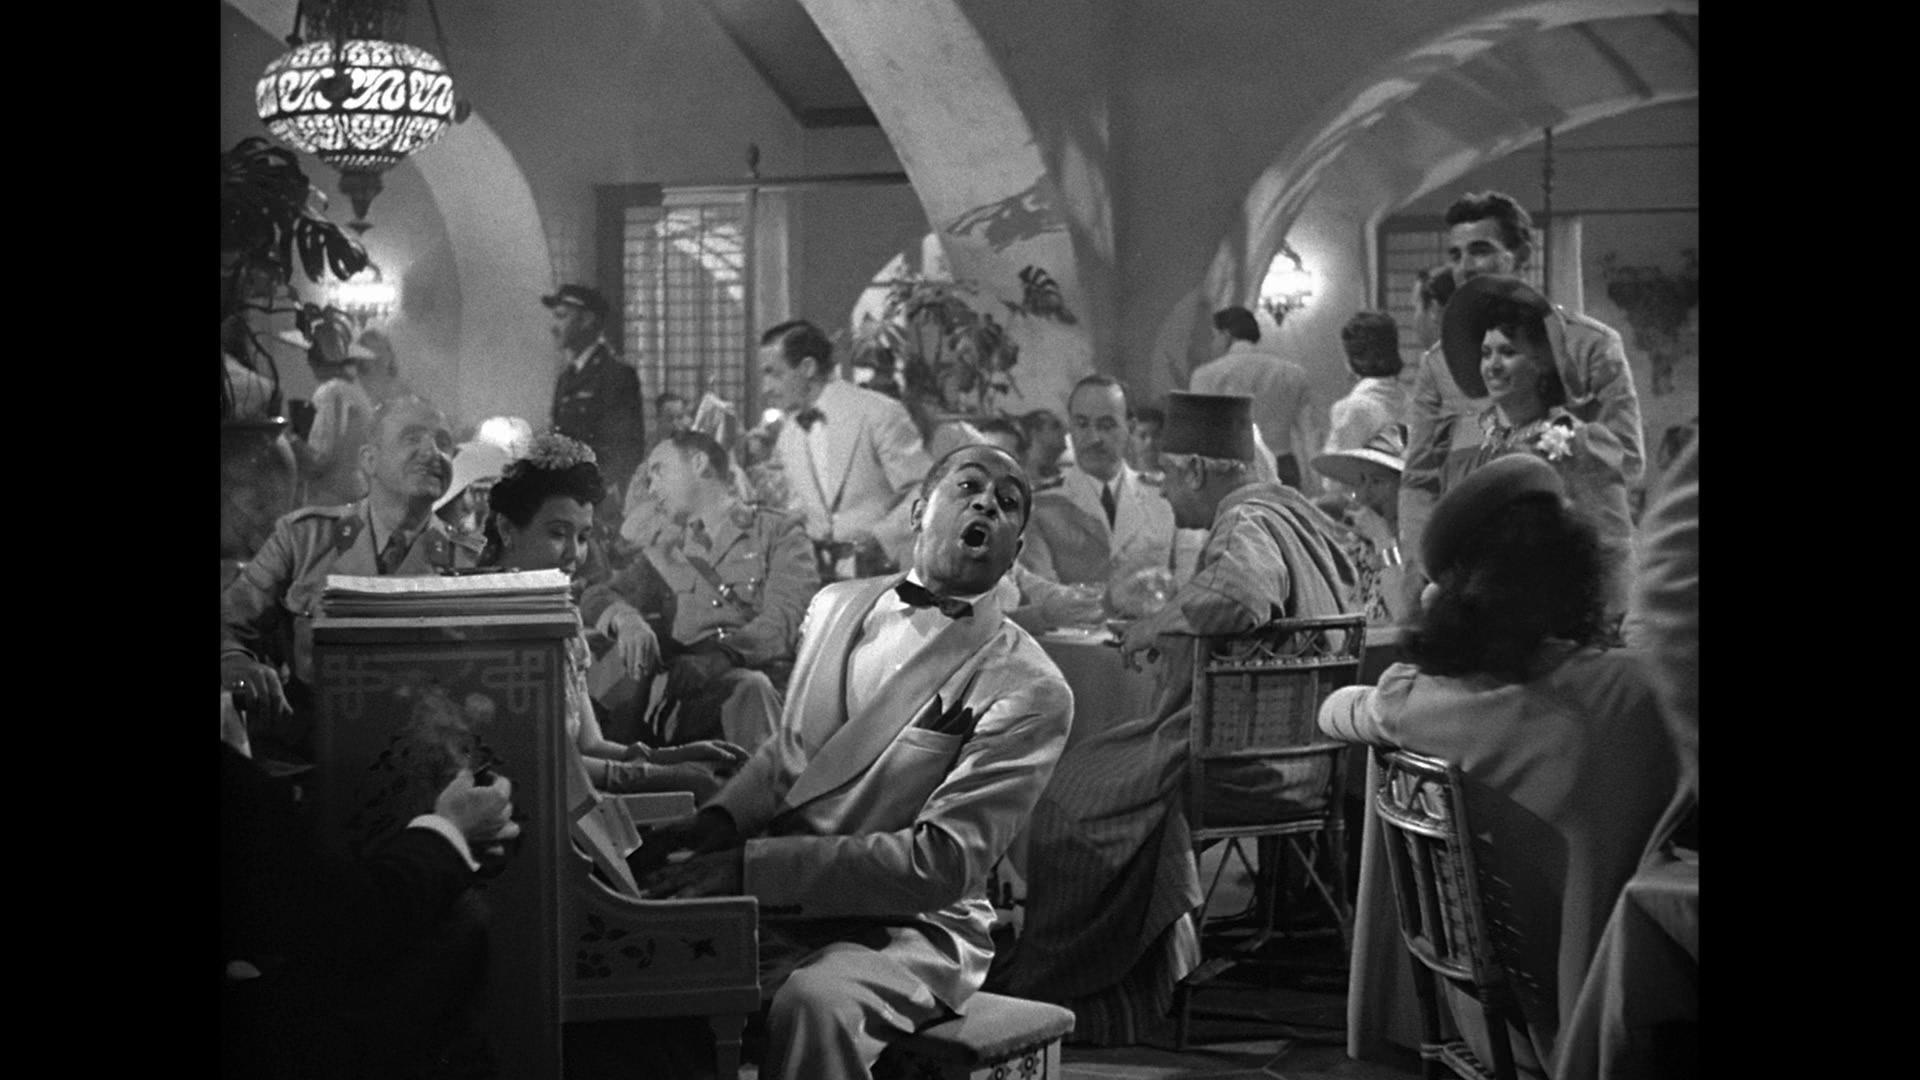 Reviure 'Casablanca' com mai ho has fet...